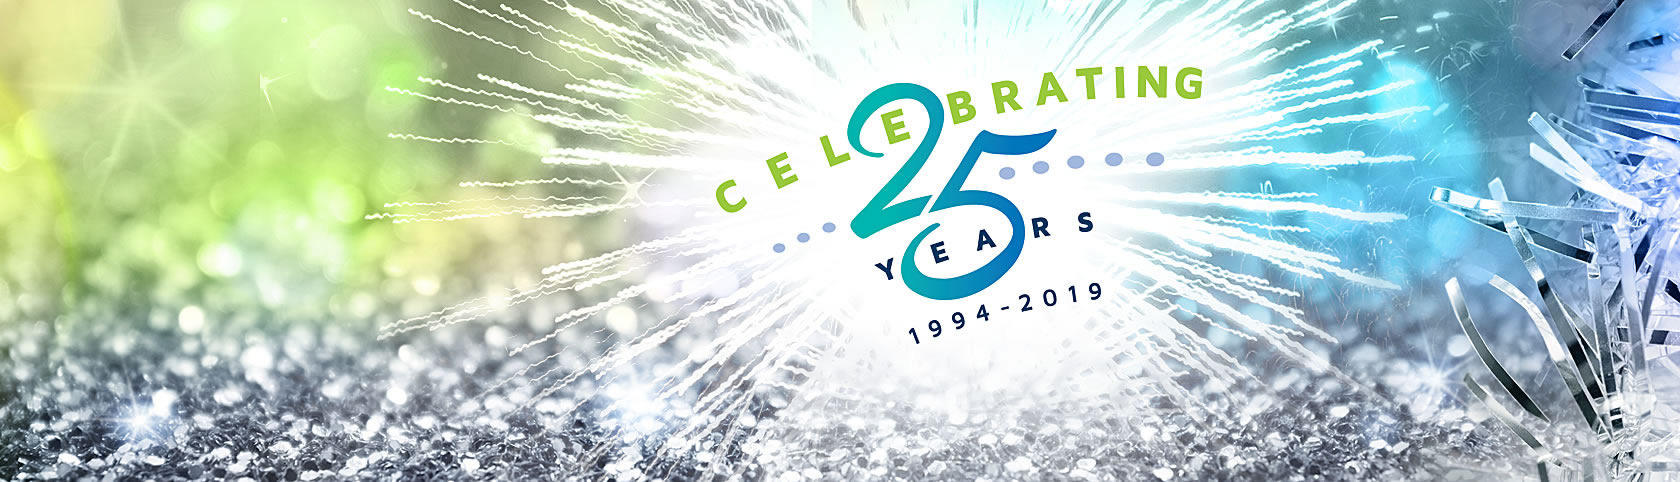 Pohms 25th Anniversary Website Rotator19